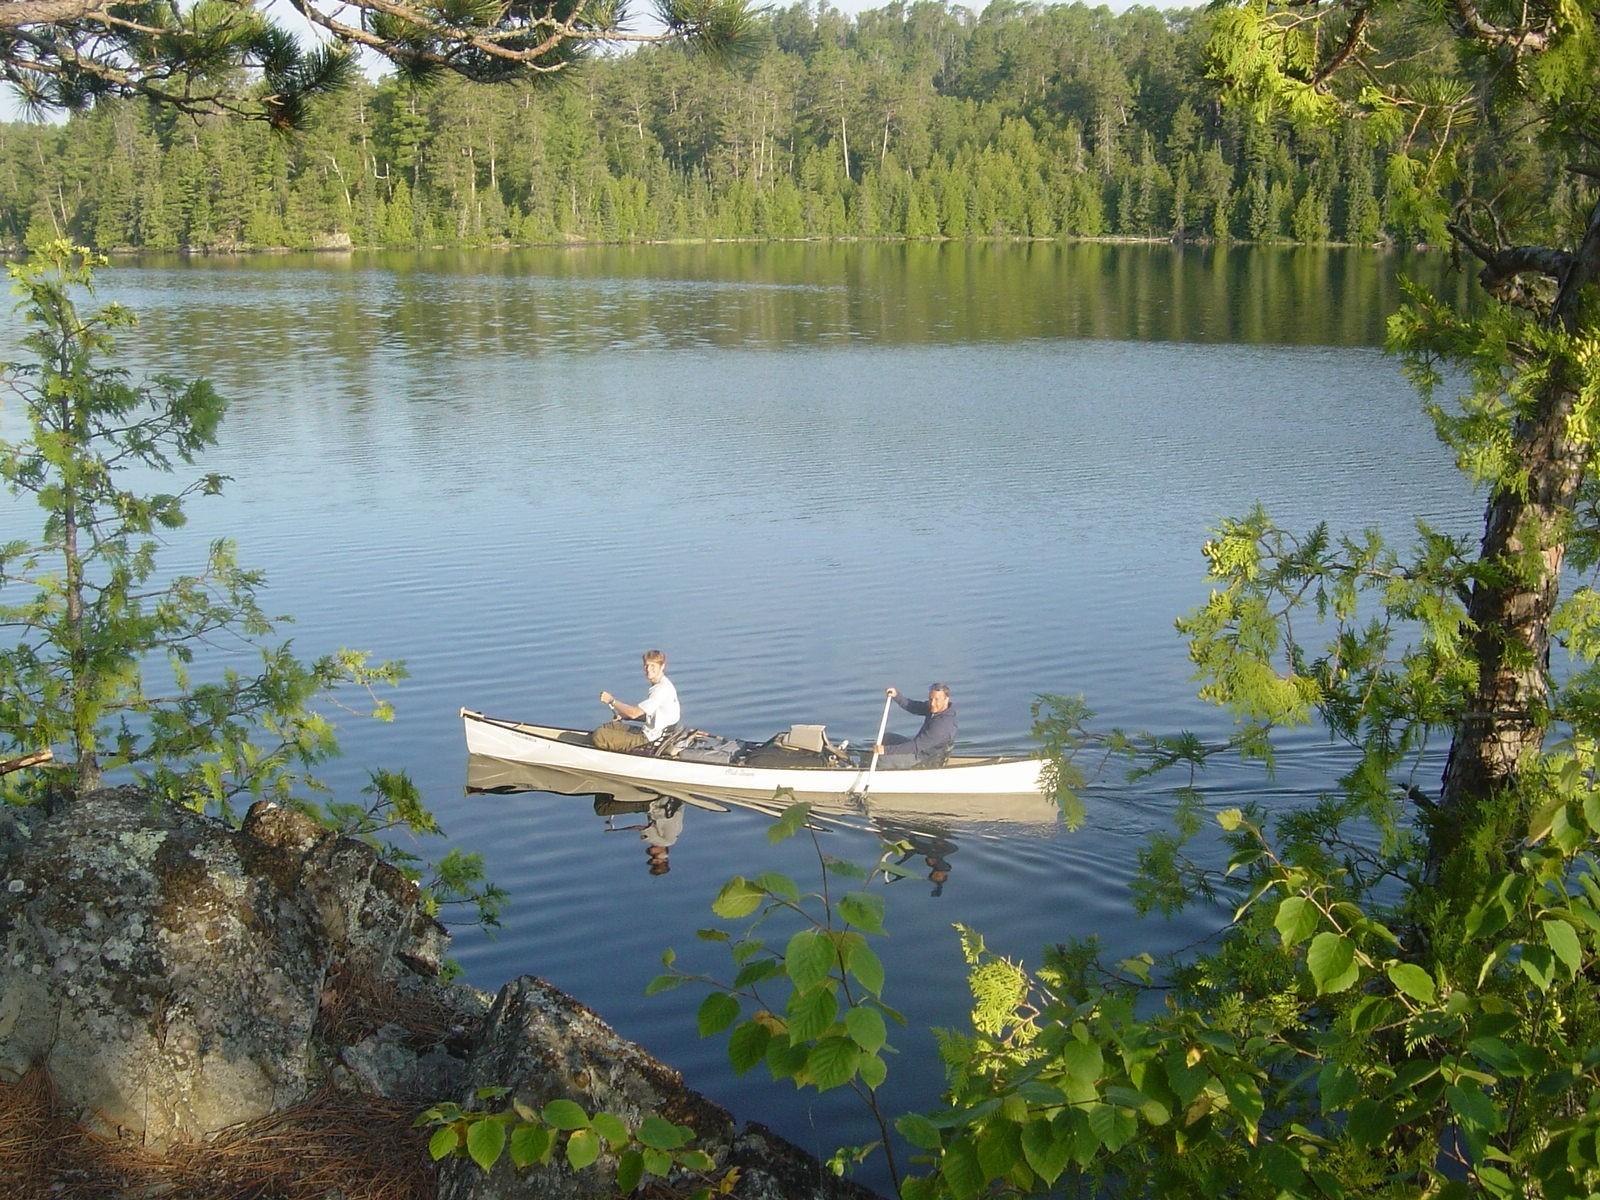 Spirit Of The Wilderness: 7 day/6 night BWCA Canoe Trip